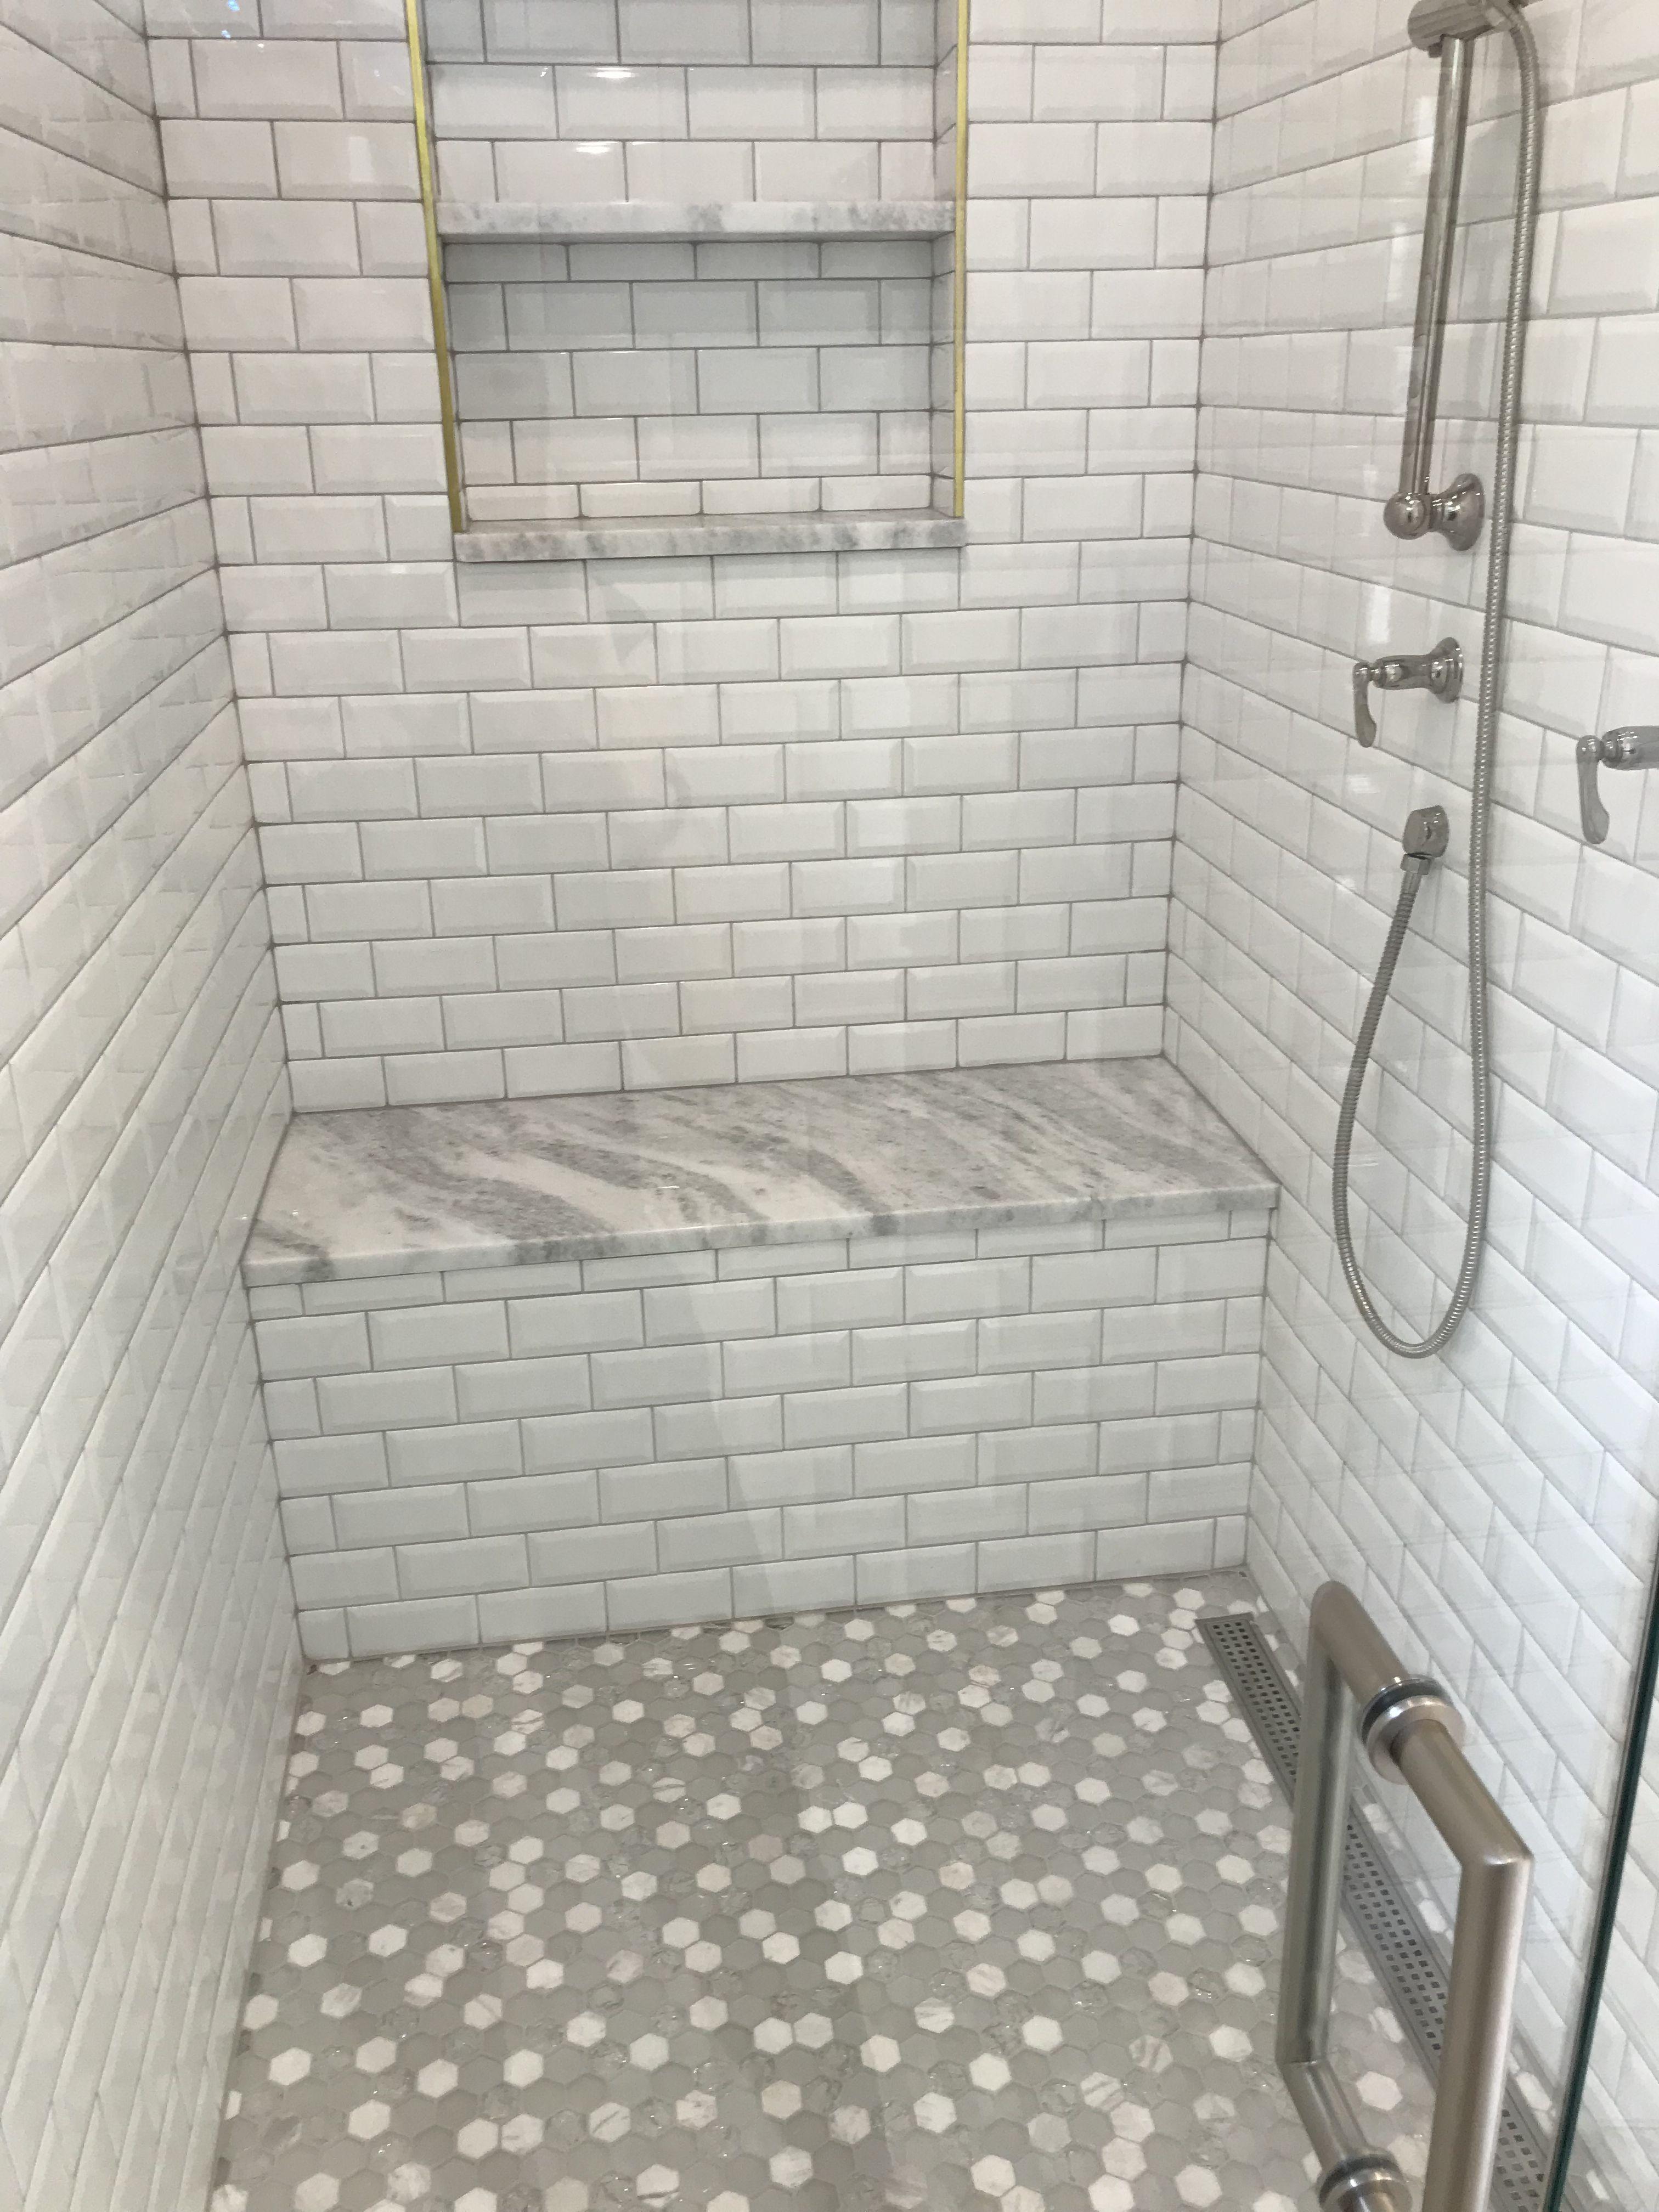 Tile Floor By Amber Bieker Stice On Master Bath Flooring Master Bath